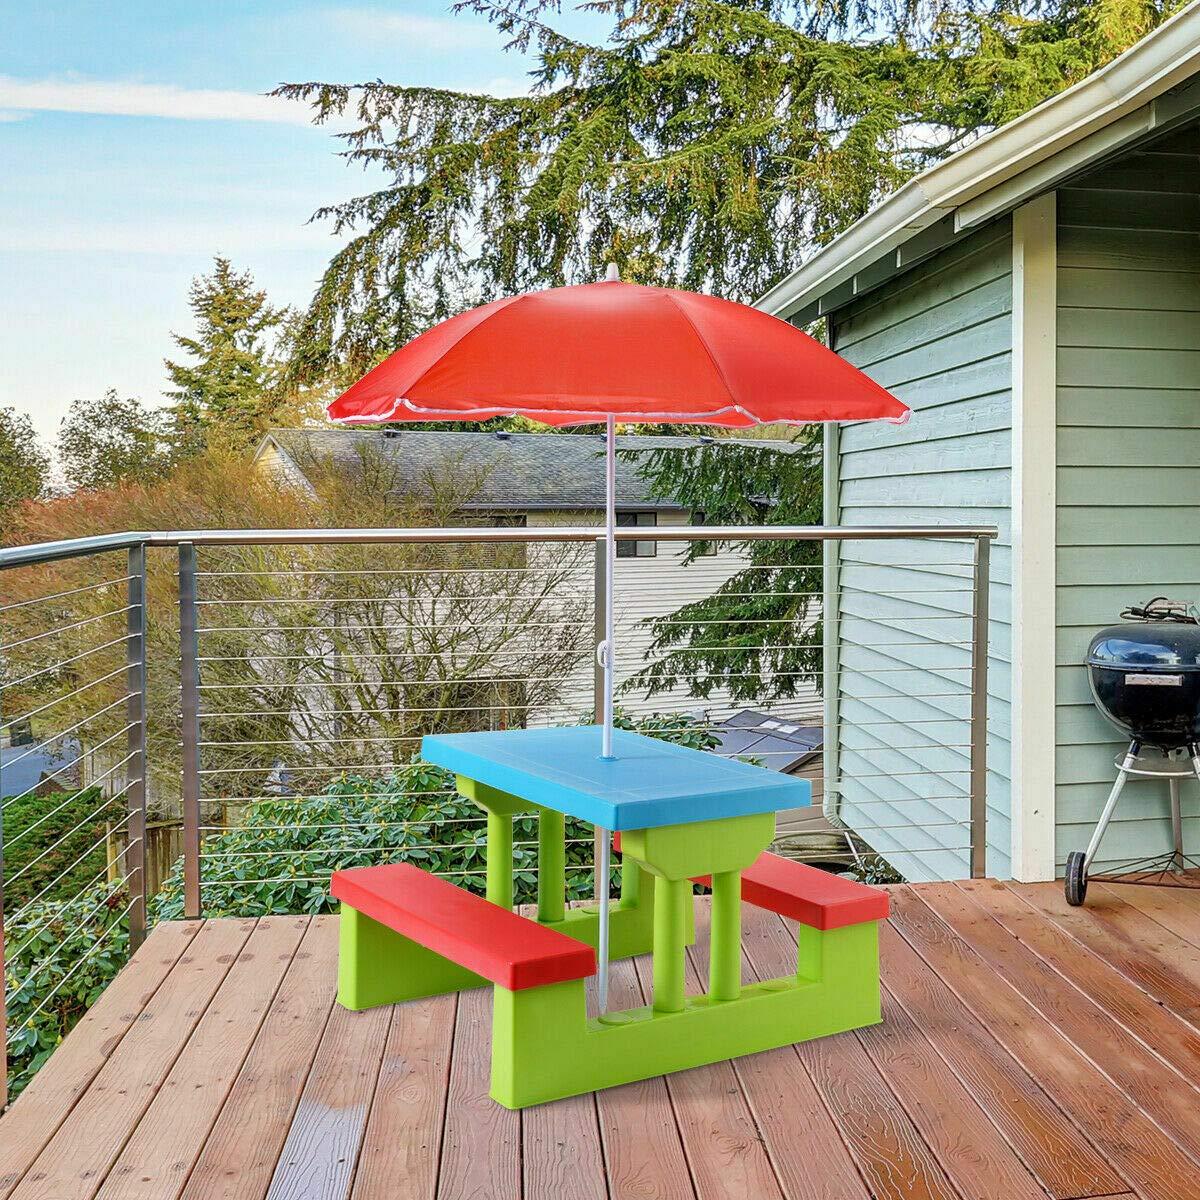 Antik shop 4 Seat Kids Picnic Table w/Umbrella Garden Yard Folding Children Bench Outdoor by Antik shop